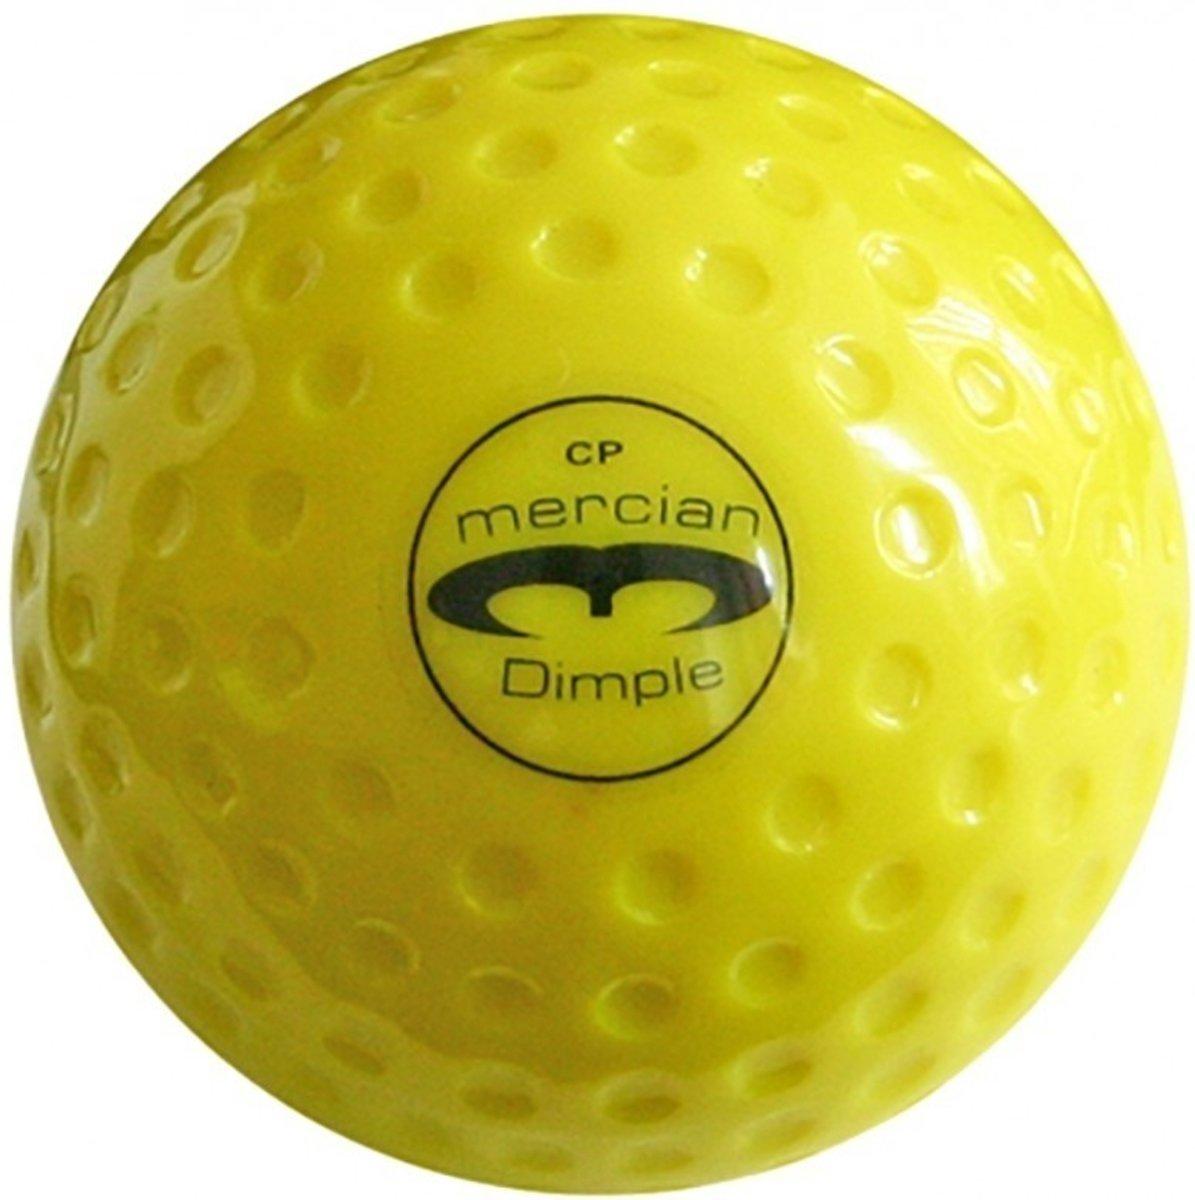 Hockeybal Dimple - geel - no logo - 120 stuks